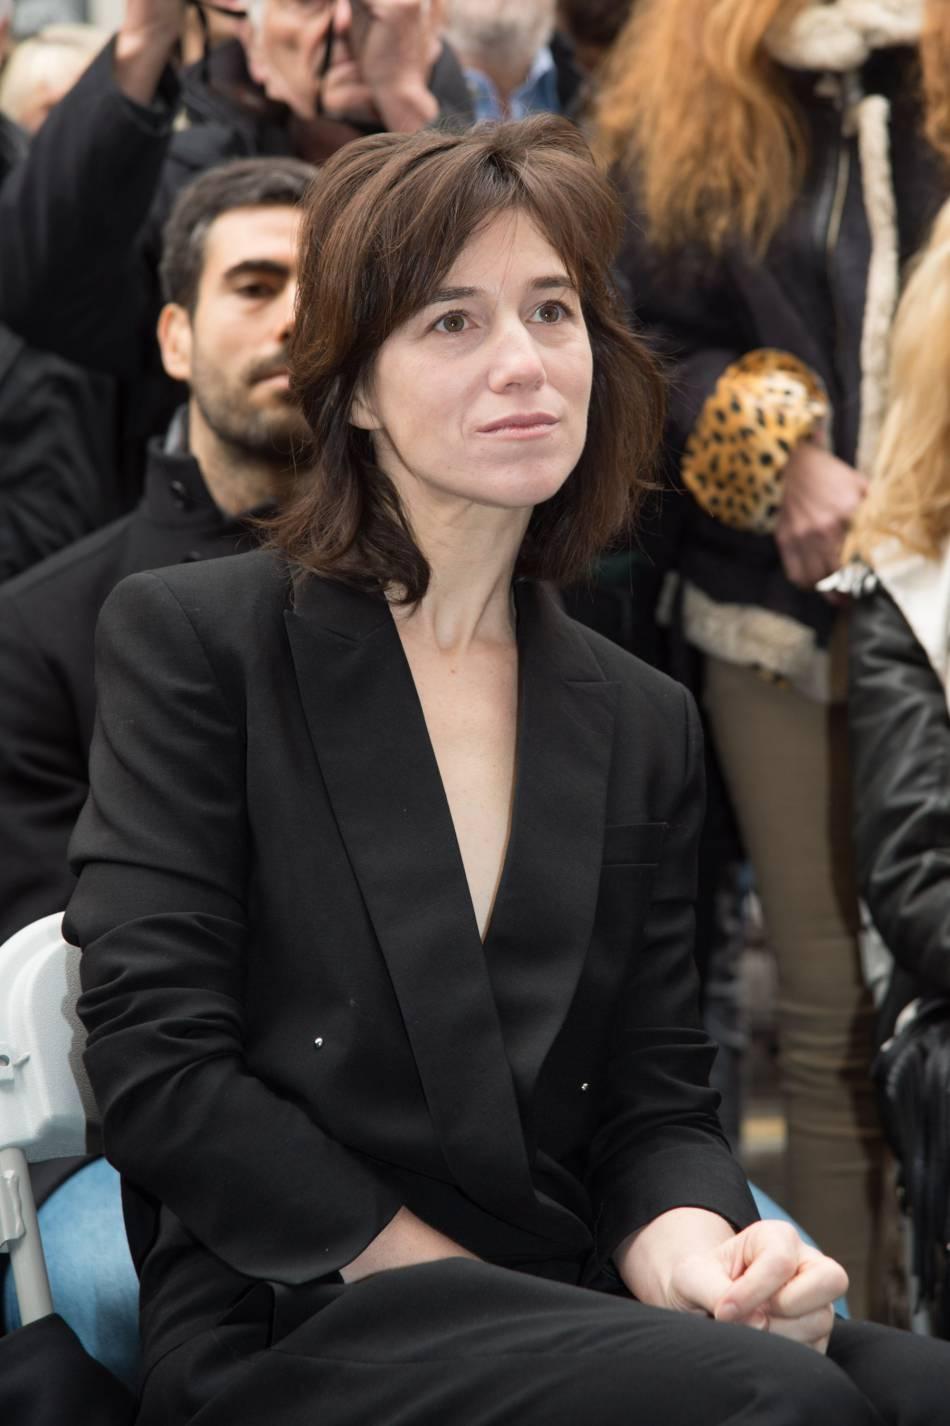 charlotte gainsbourg l 39 actrice d voile sa nouvelle coupe